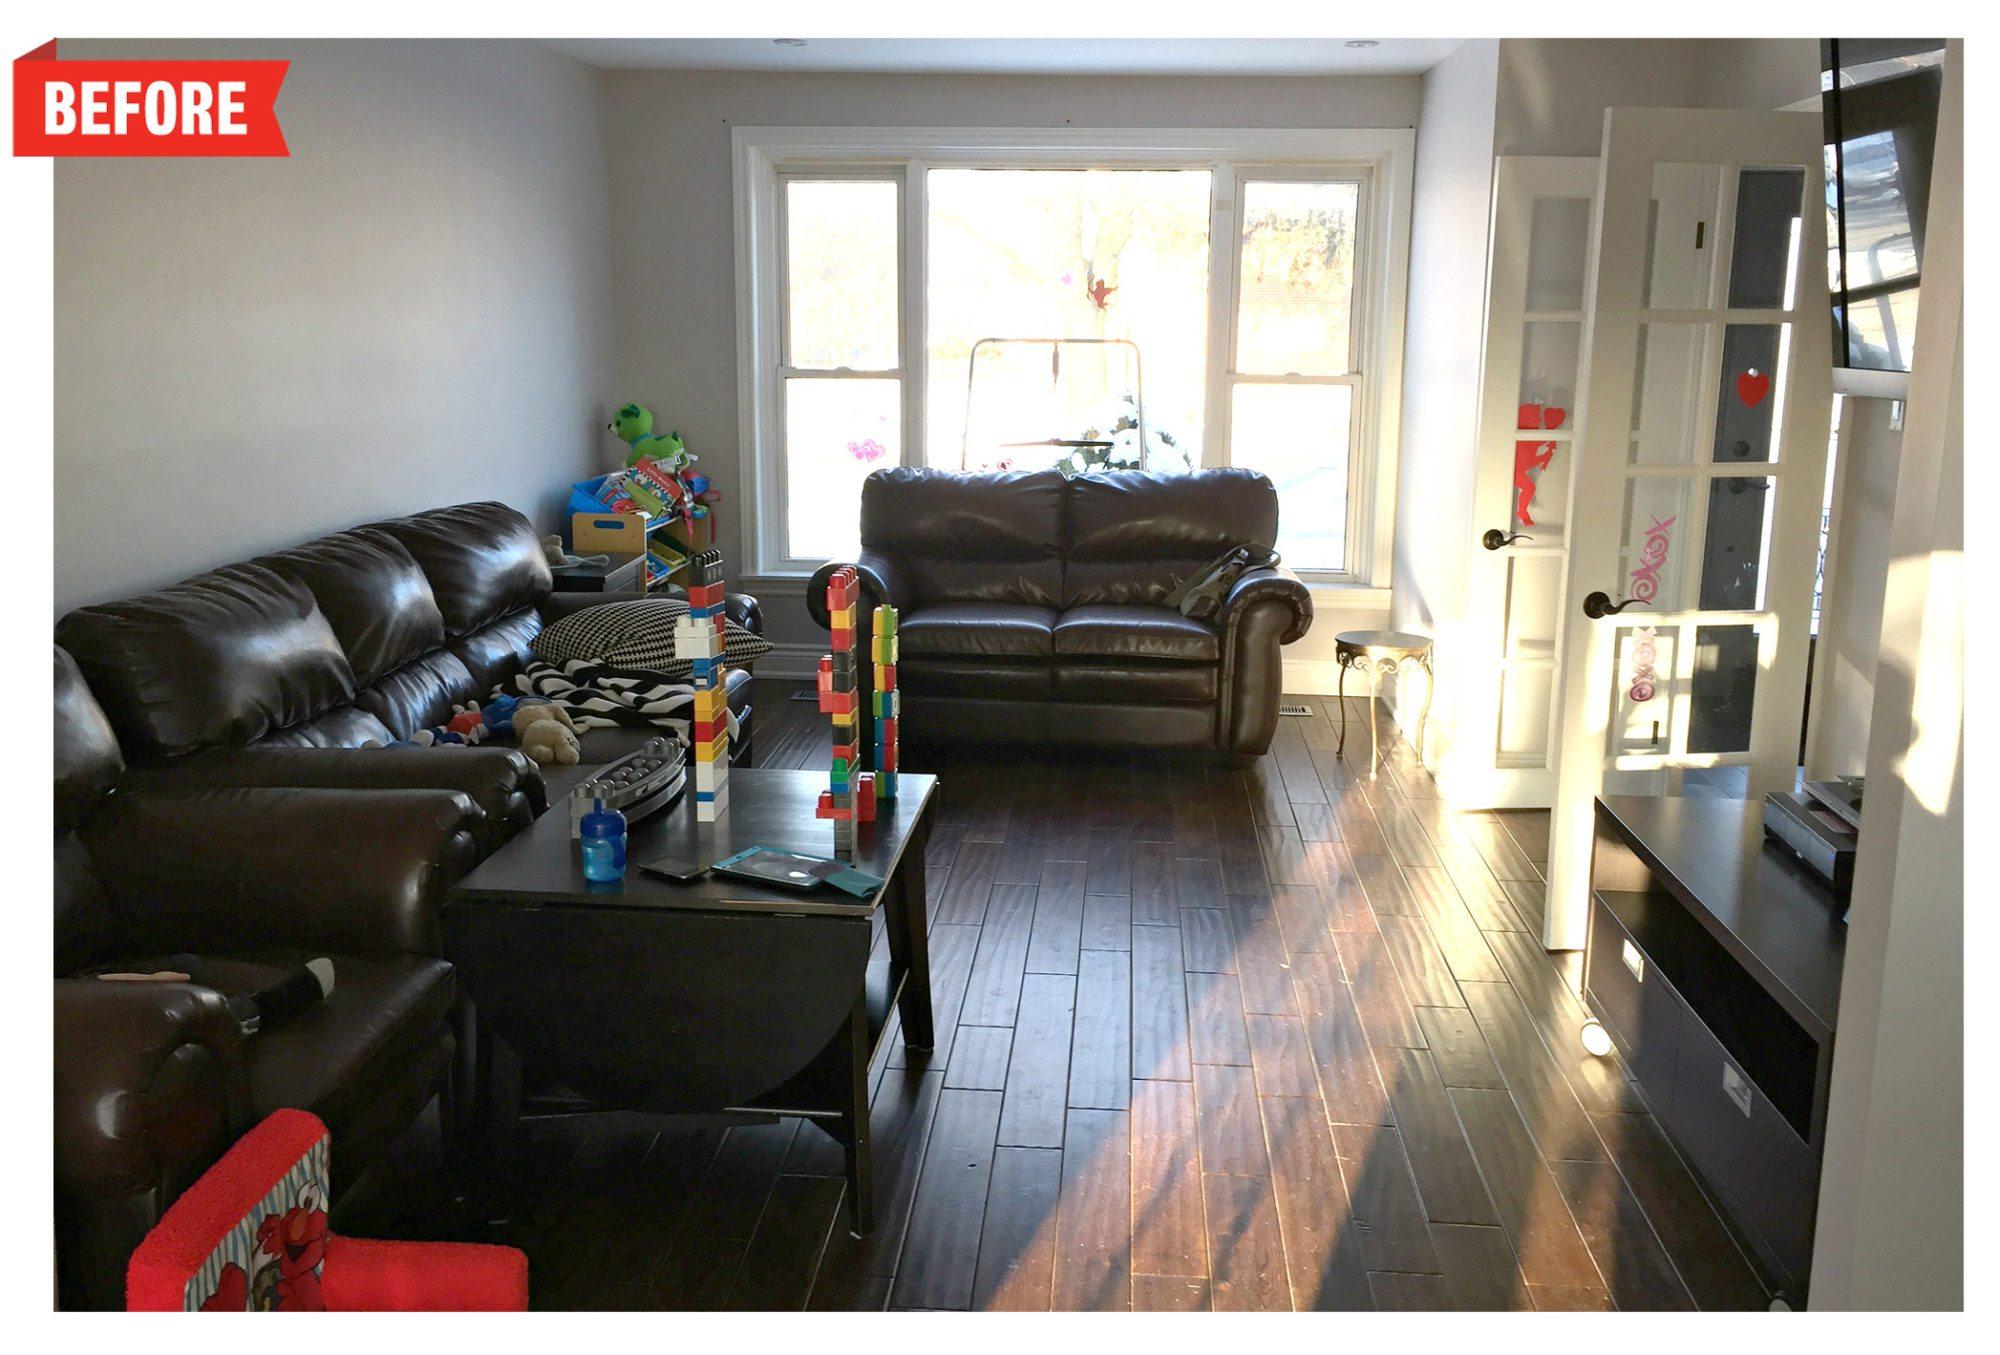 redgrave-living-room-before